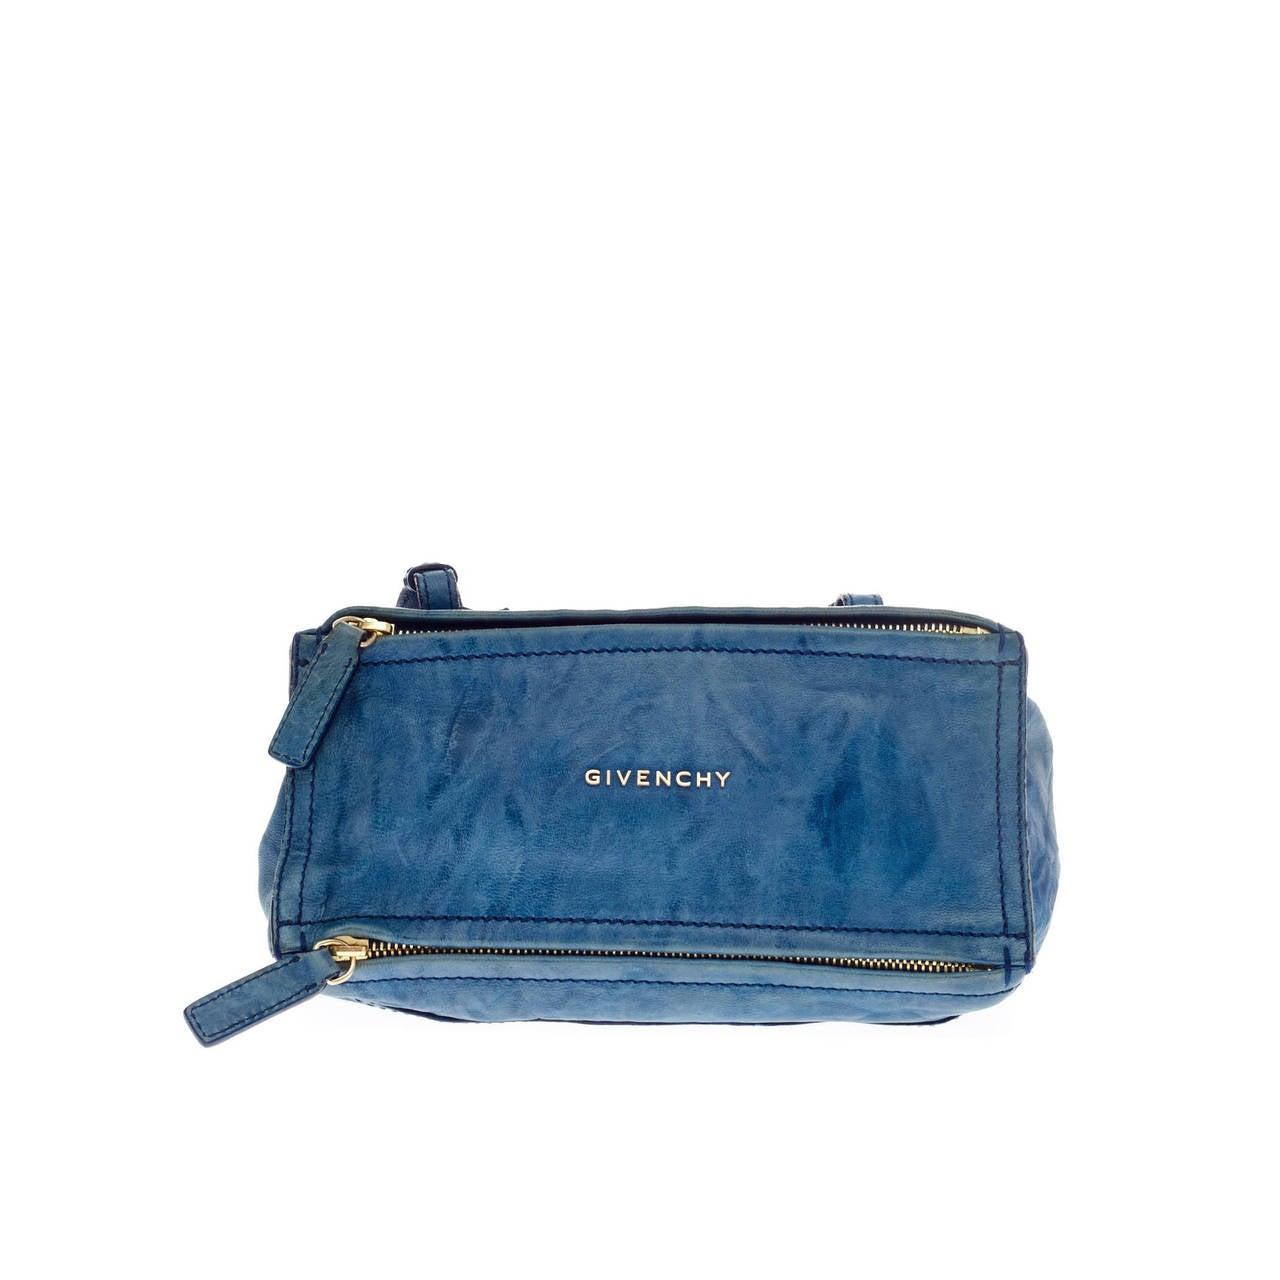 Givenchy Pandora Bag Leather Mini 1